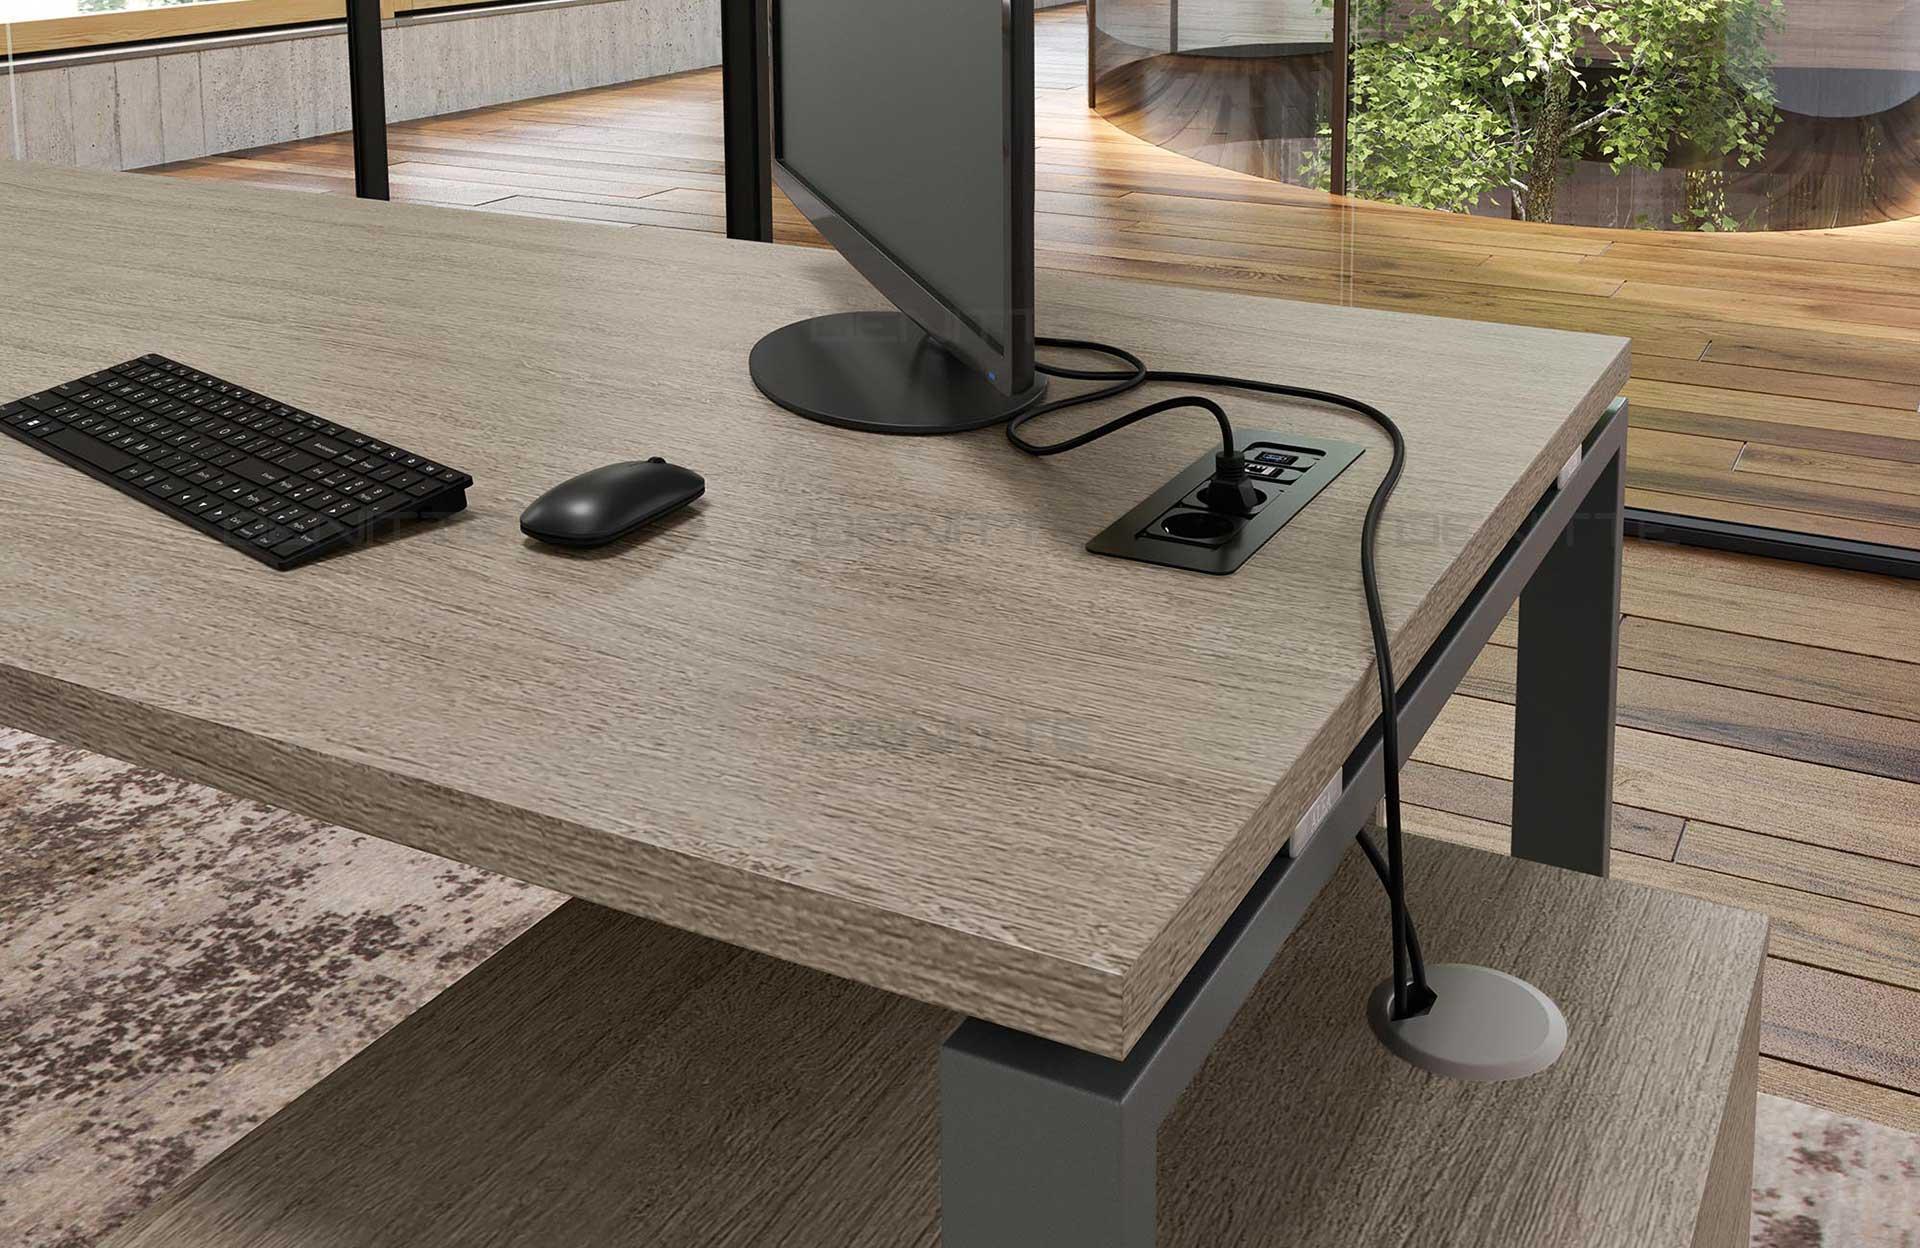 لوازم جانبی میز مدیریت دیسو